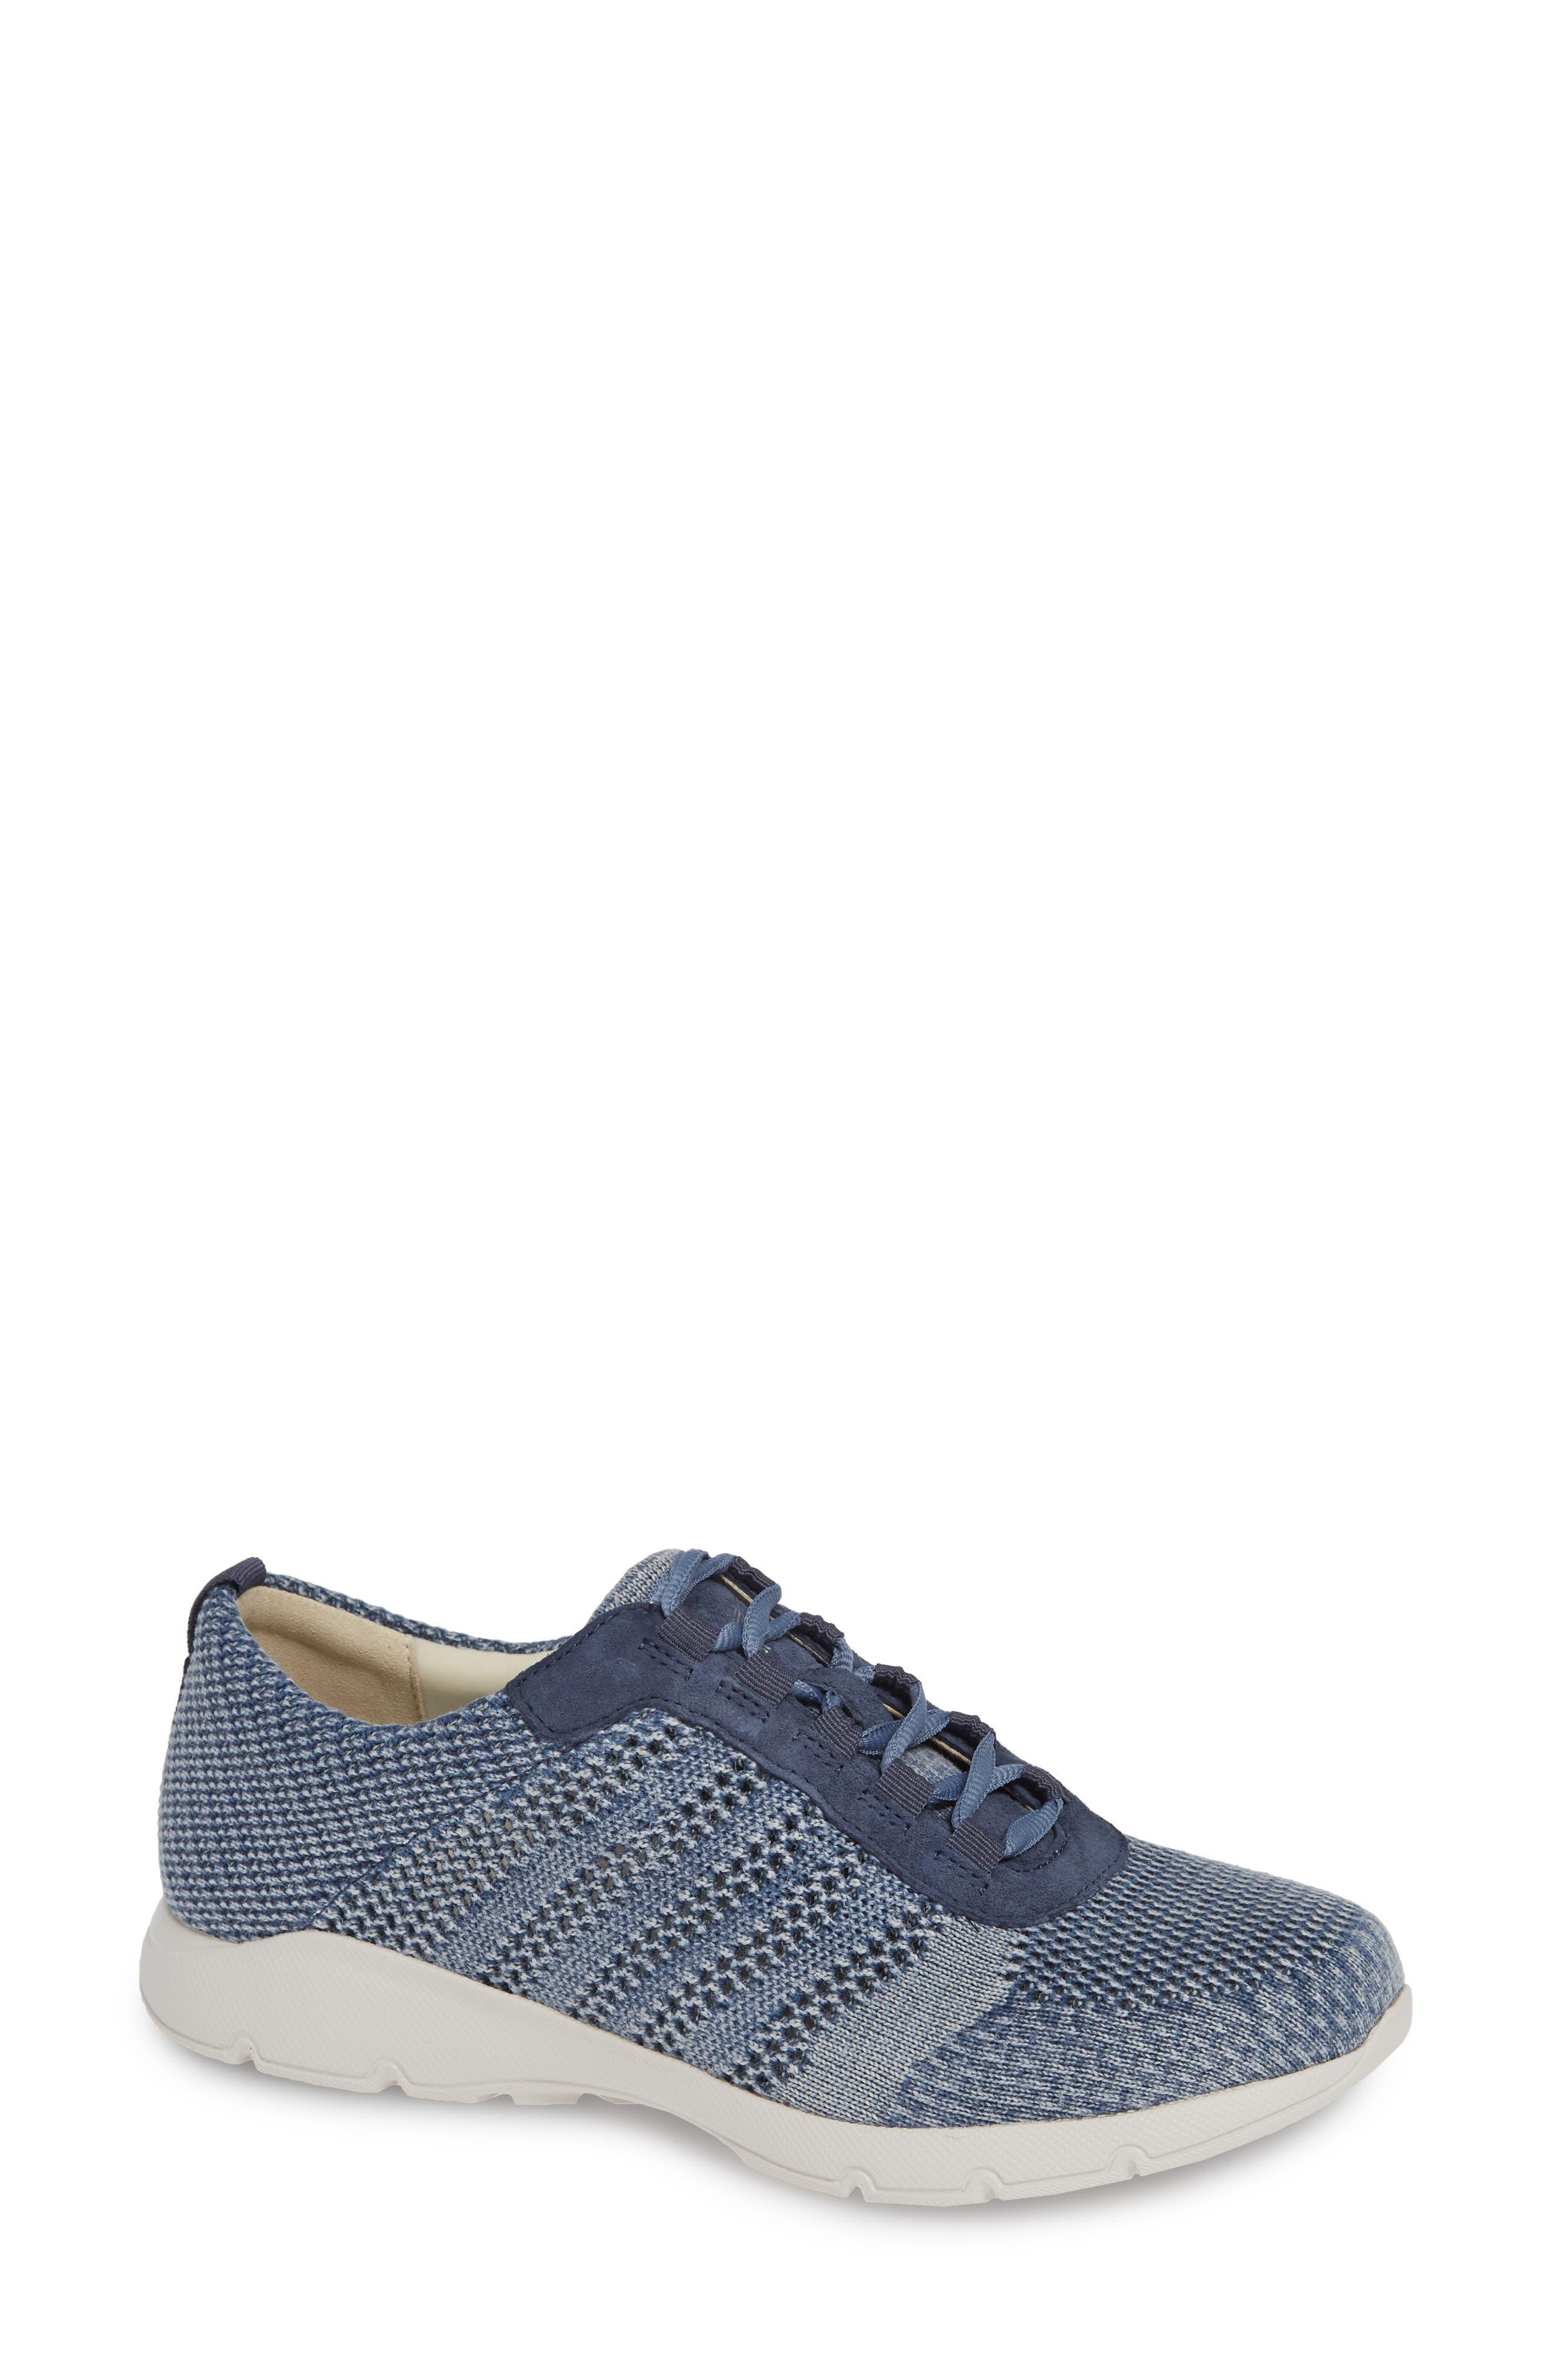 DANSKO, Adrianne Sneaker, Main thumbnail 1, color, DENIM